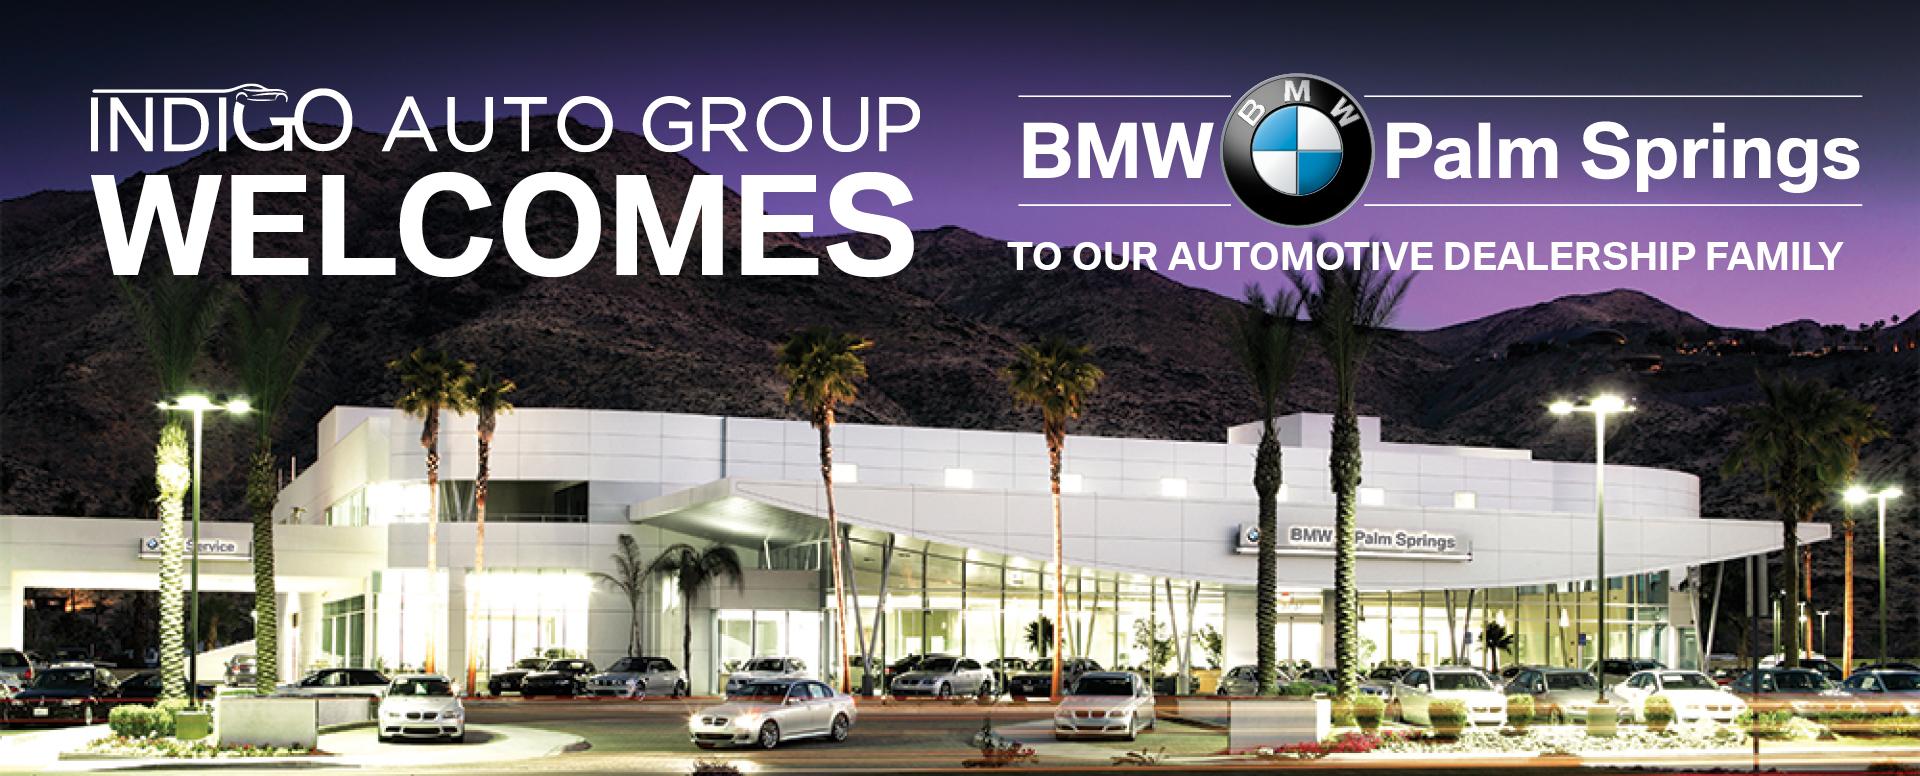 Desert European Motorcars >> Lamborghini Houston - Help Us Welcome BMW of Palm Springs to indiGO Auto Group